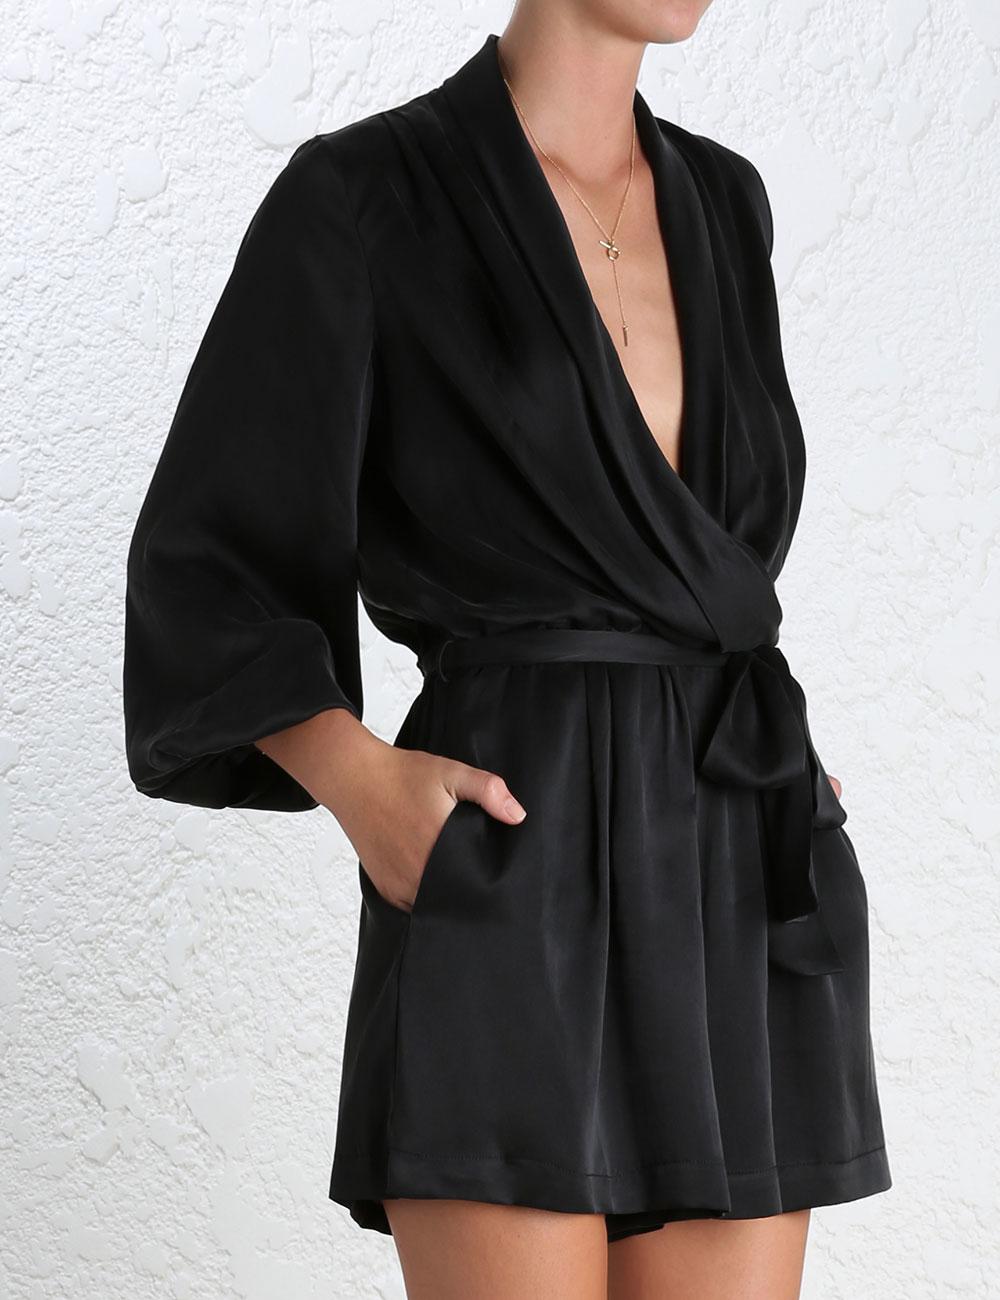 2536d36dc1 Lyst - Zimmermann Sueded Silk Wrap Playsuit in Black